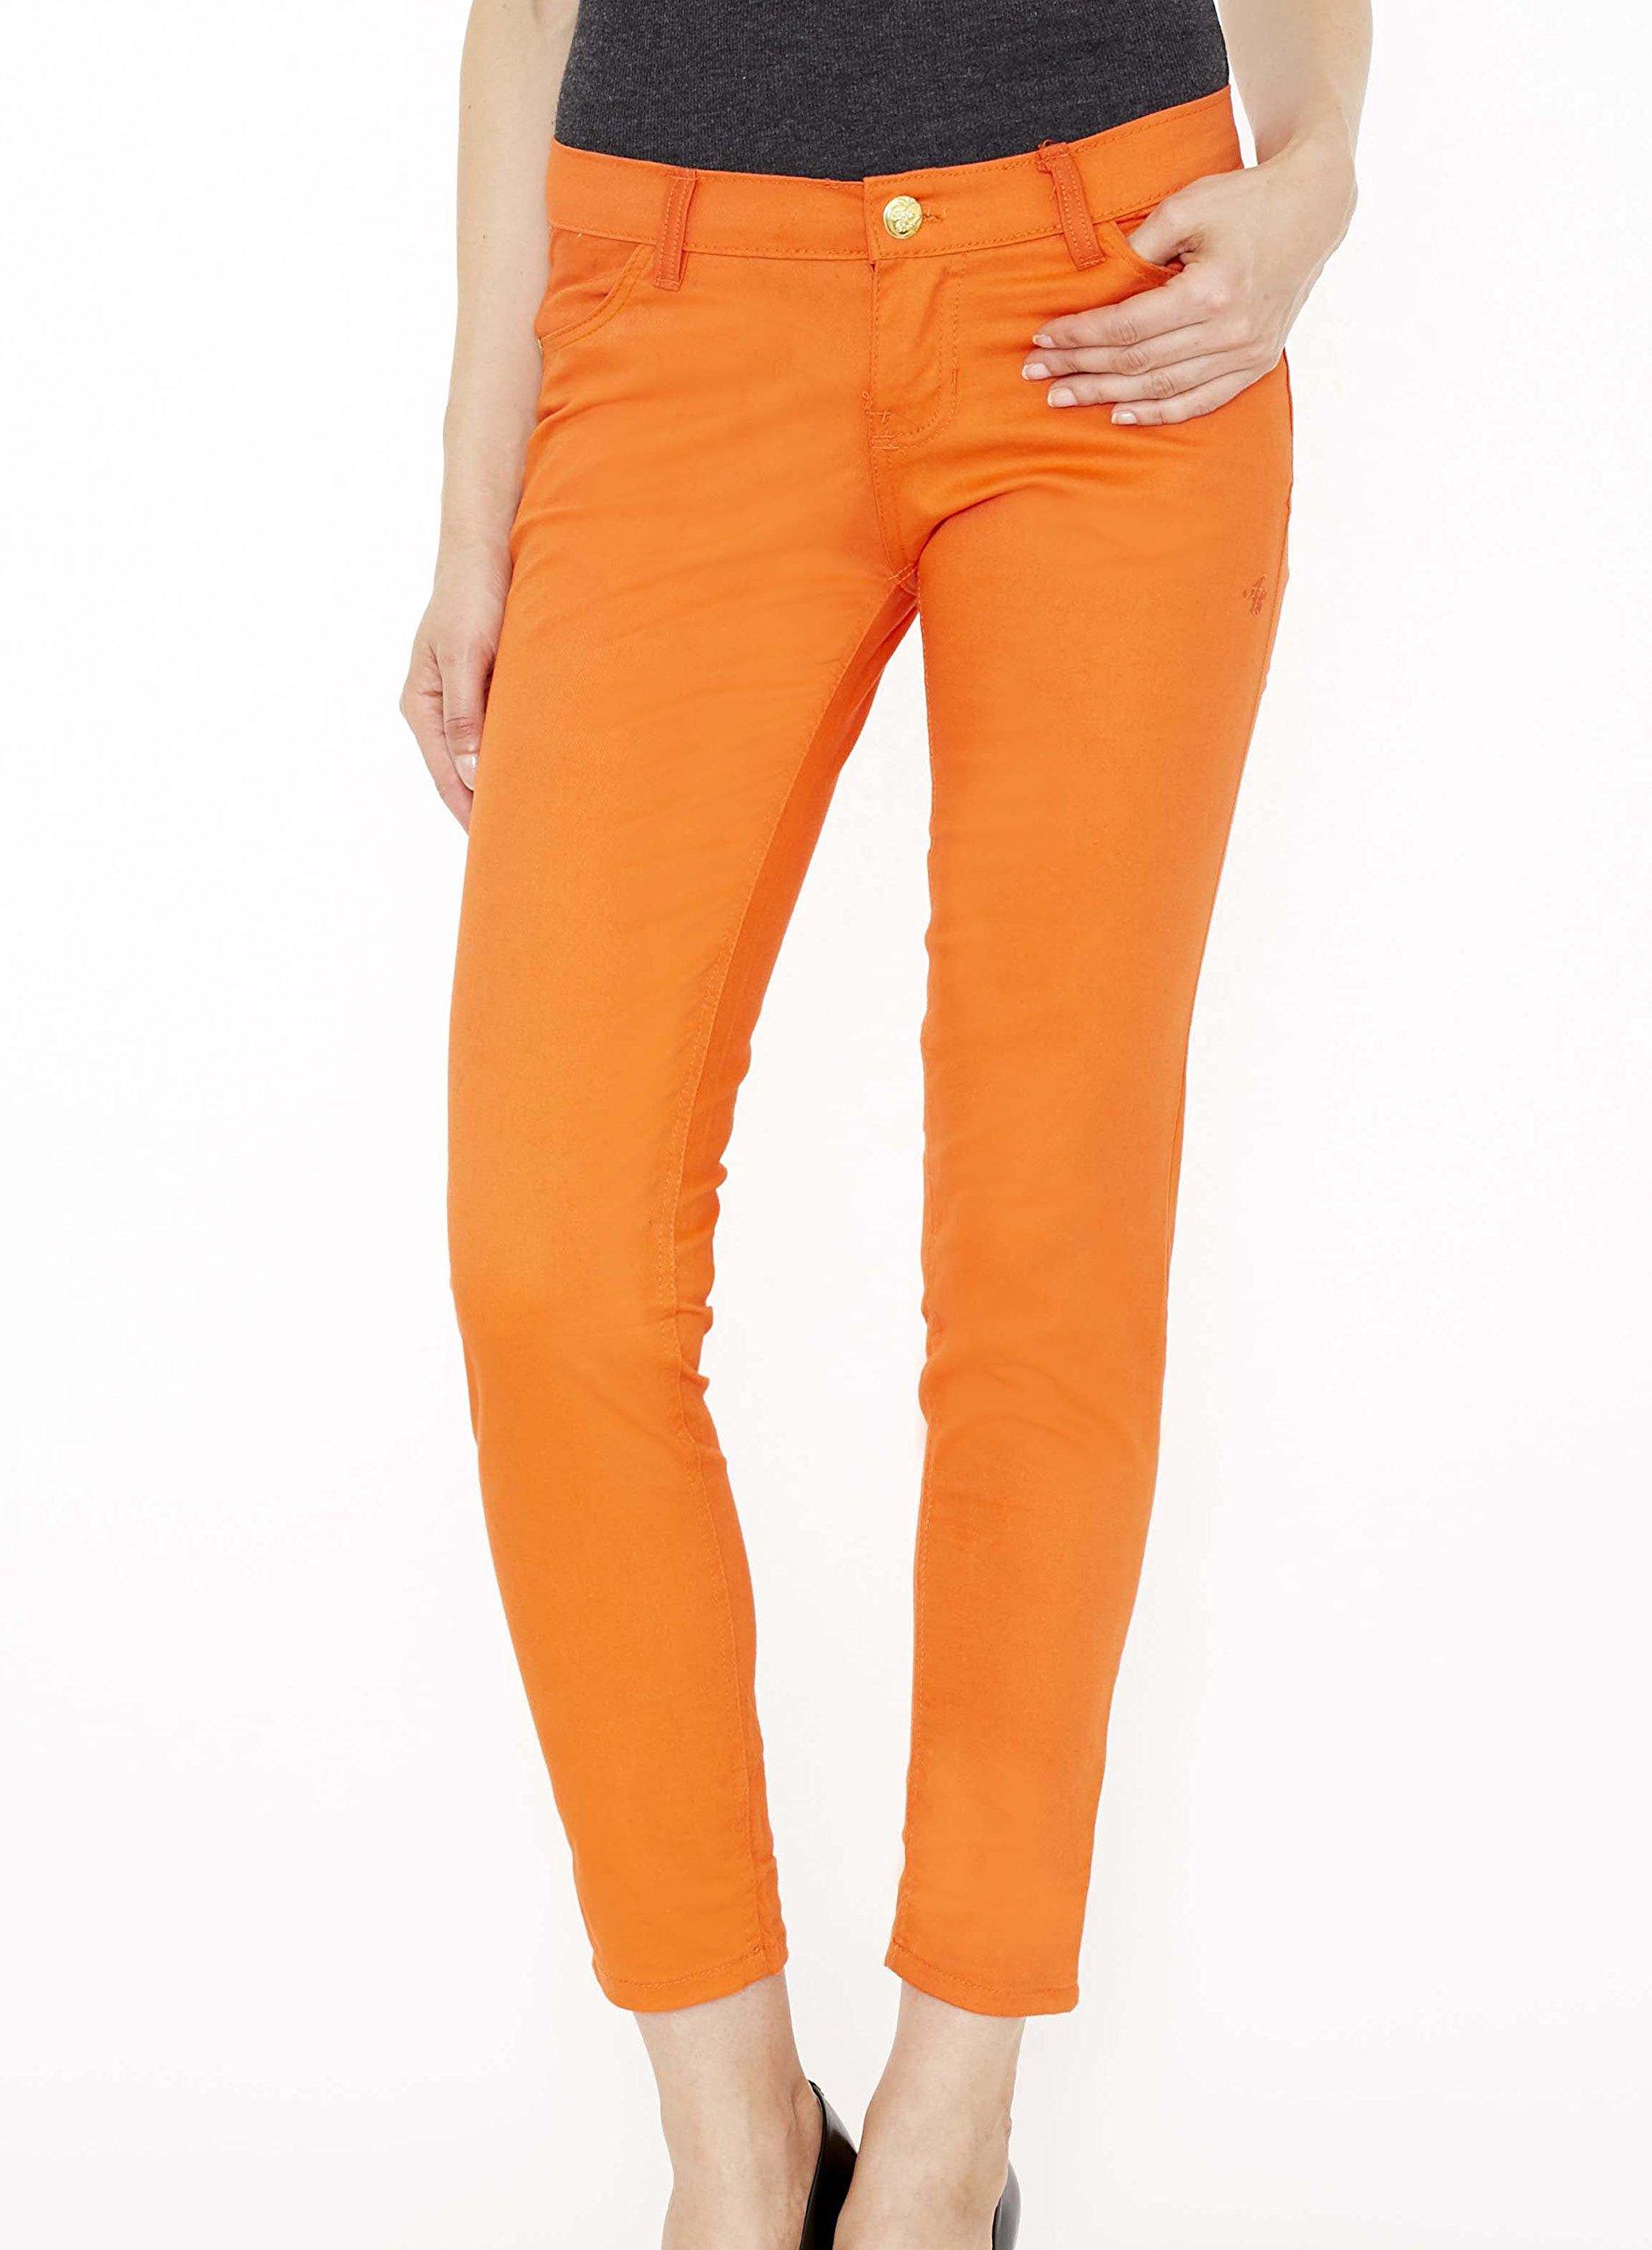 Apple Bottoms Junior Cut Women's Jeans- Orange - 5/6